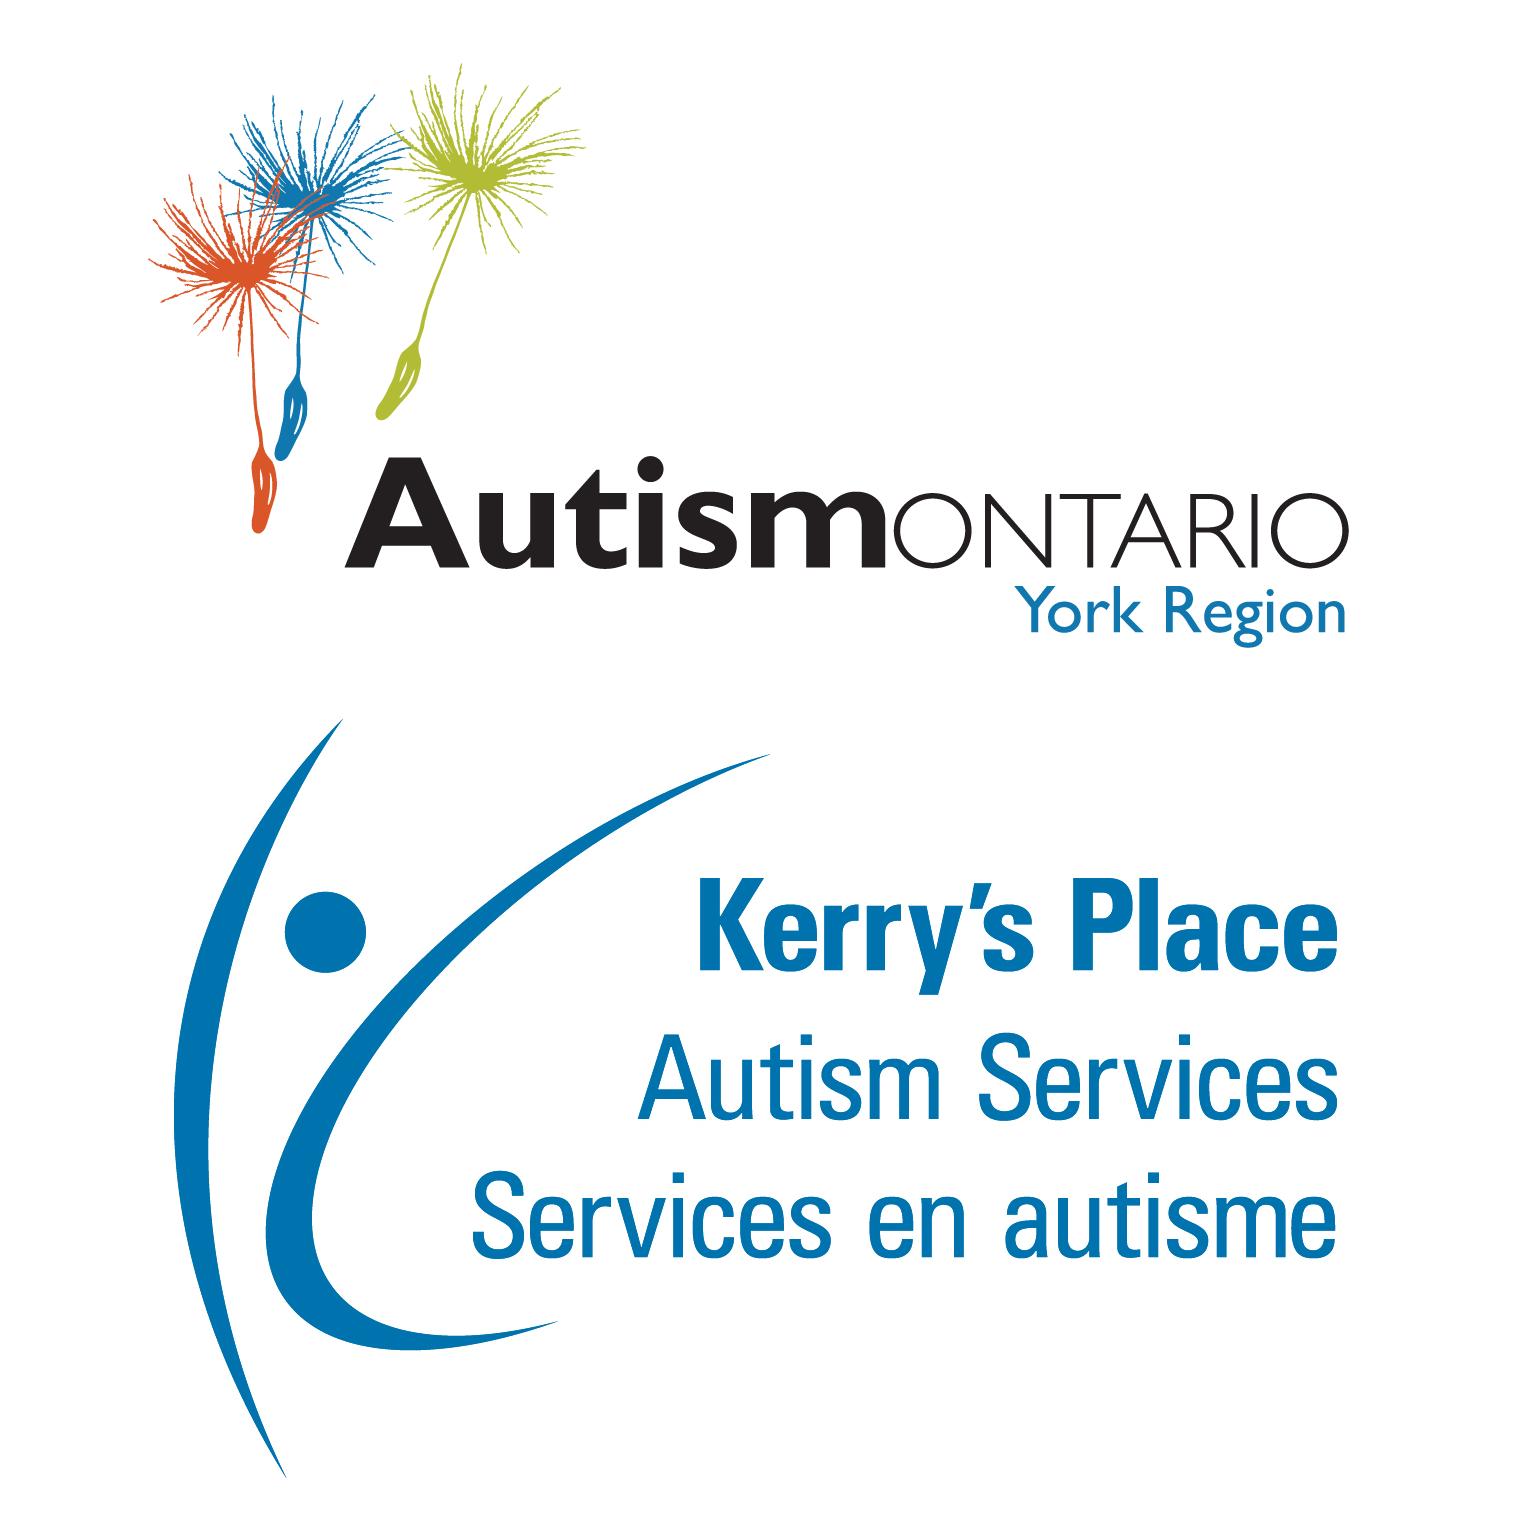 Kerry's Place Autism Services & Autism Ontario York Region